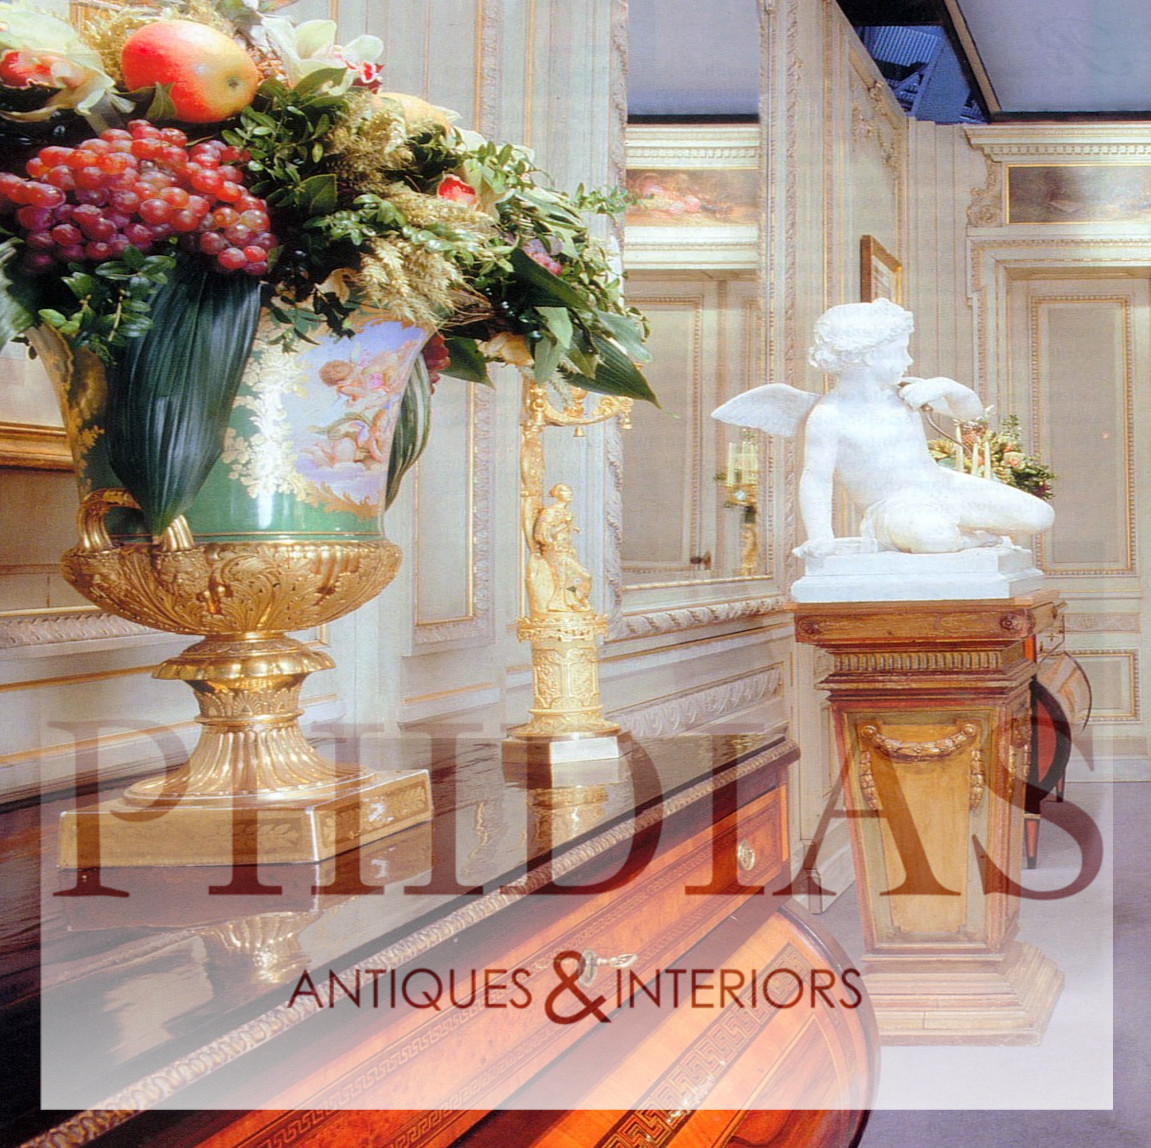 christofle orangerie vase of tous les antiquaires de proantic in phidias antique